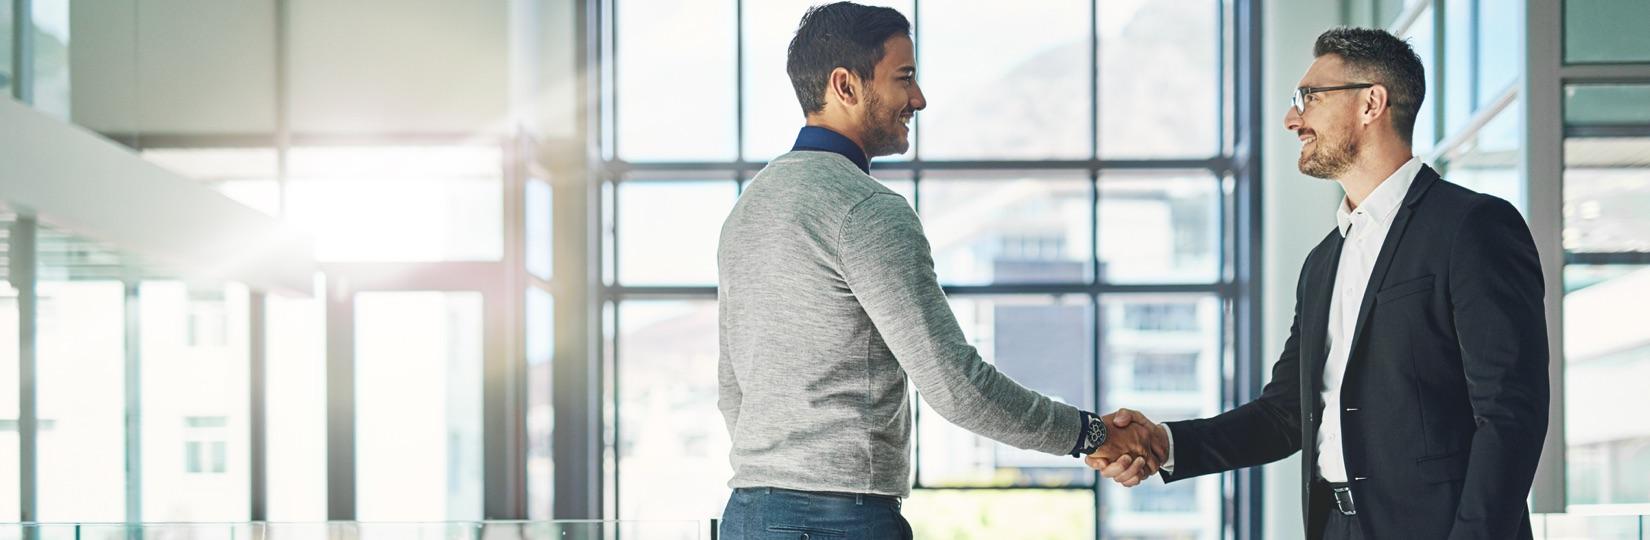 image of men shaking hands